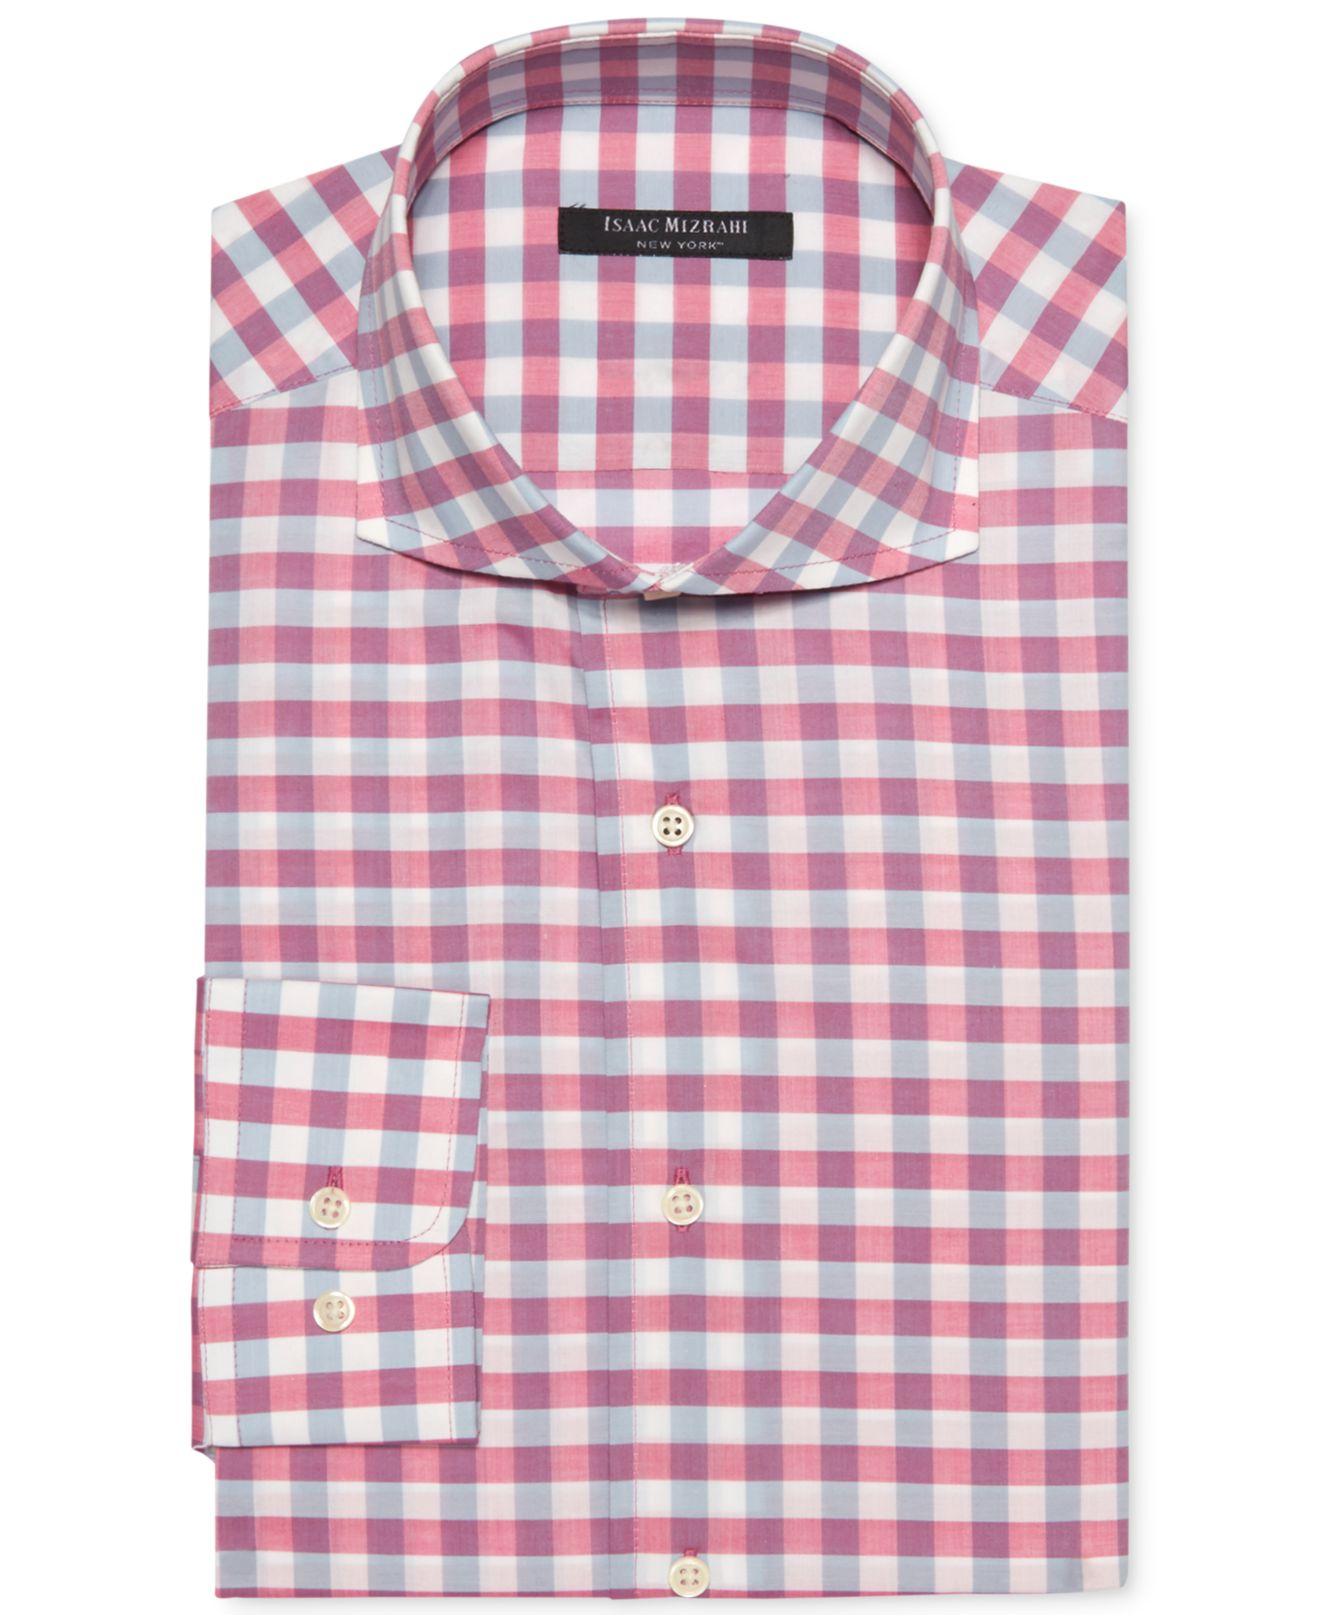 Lyst Isaac Mizrahi New York Slim Fit Gingham Dress Shirt In Pink